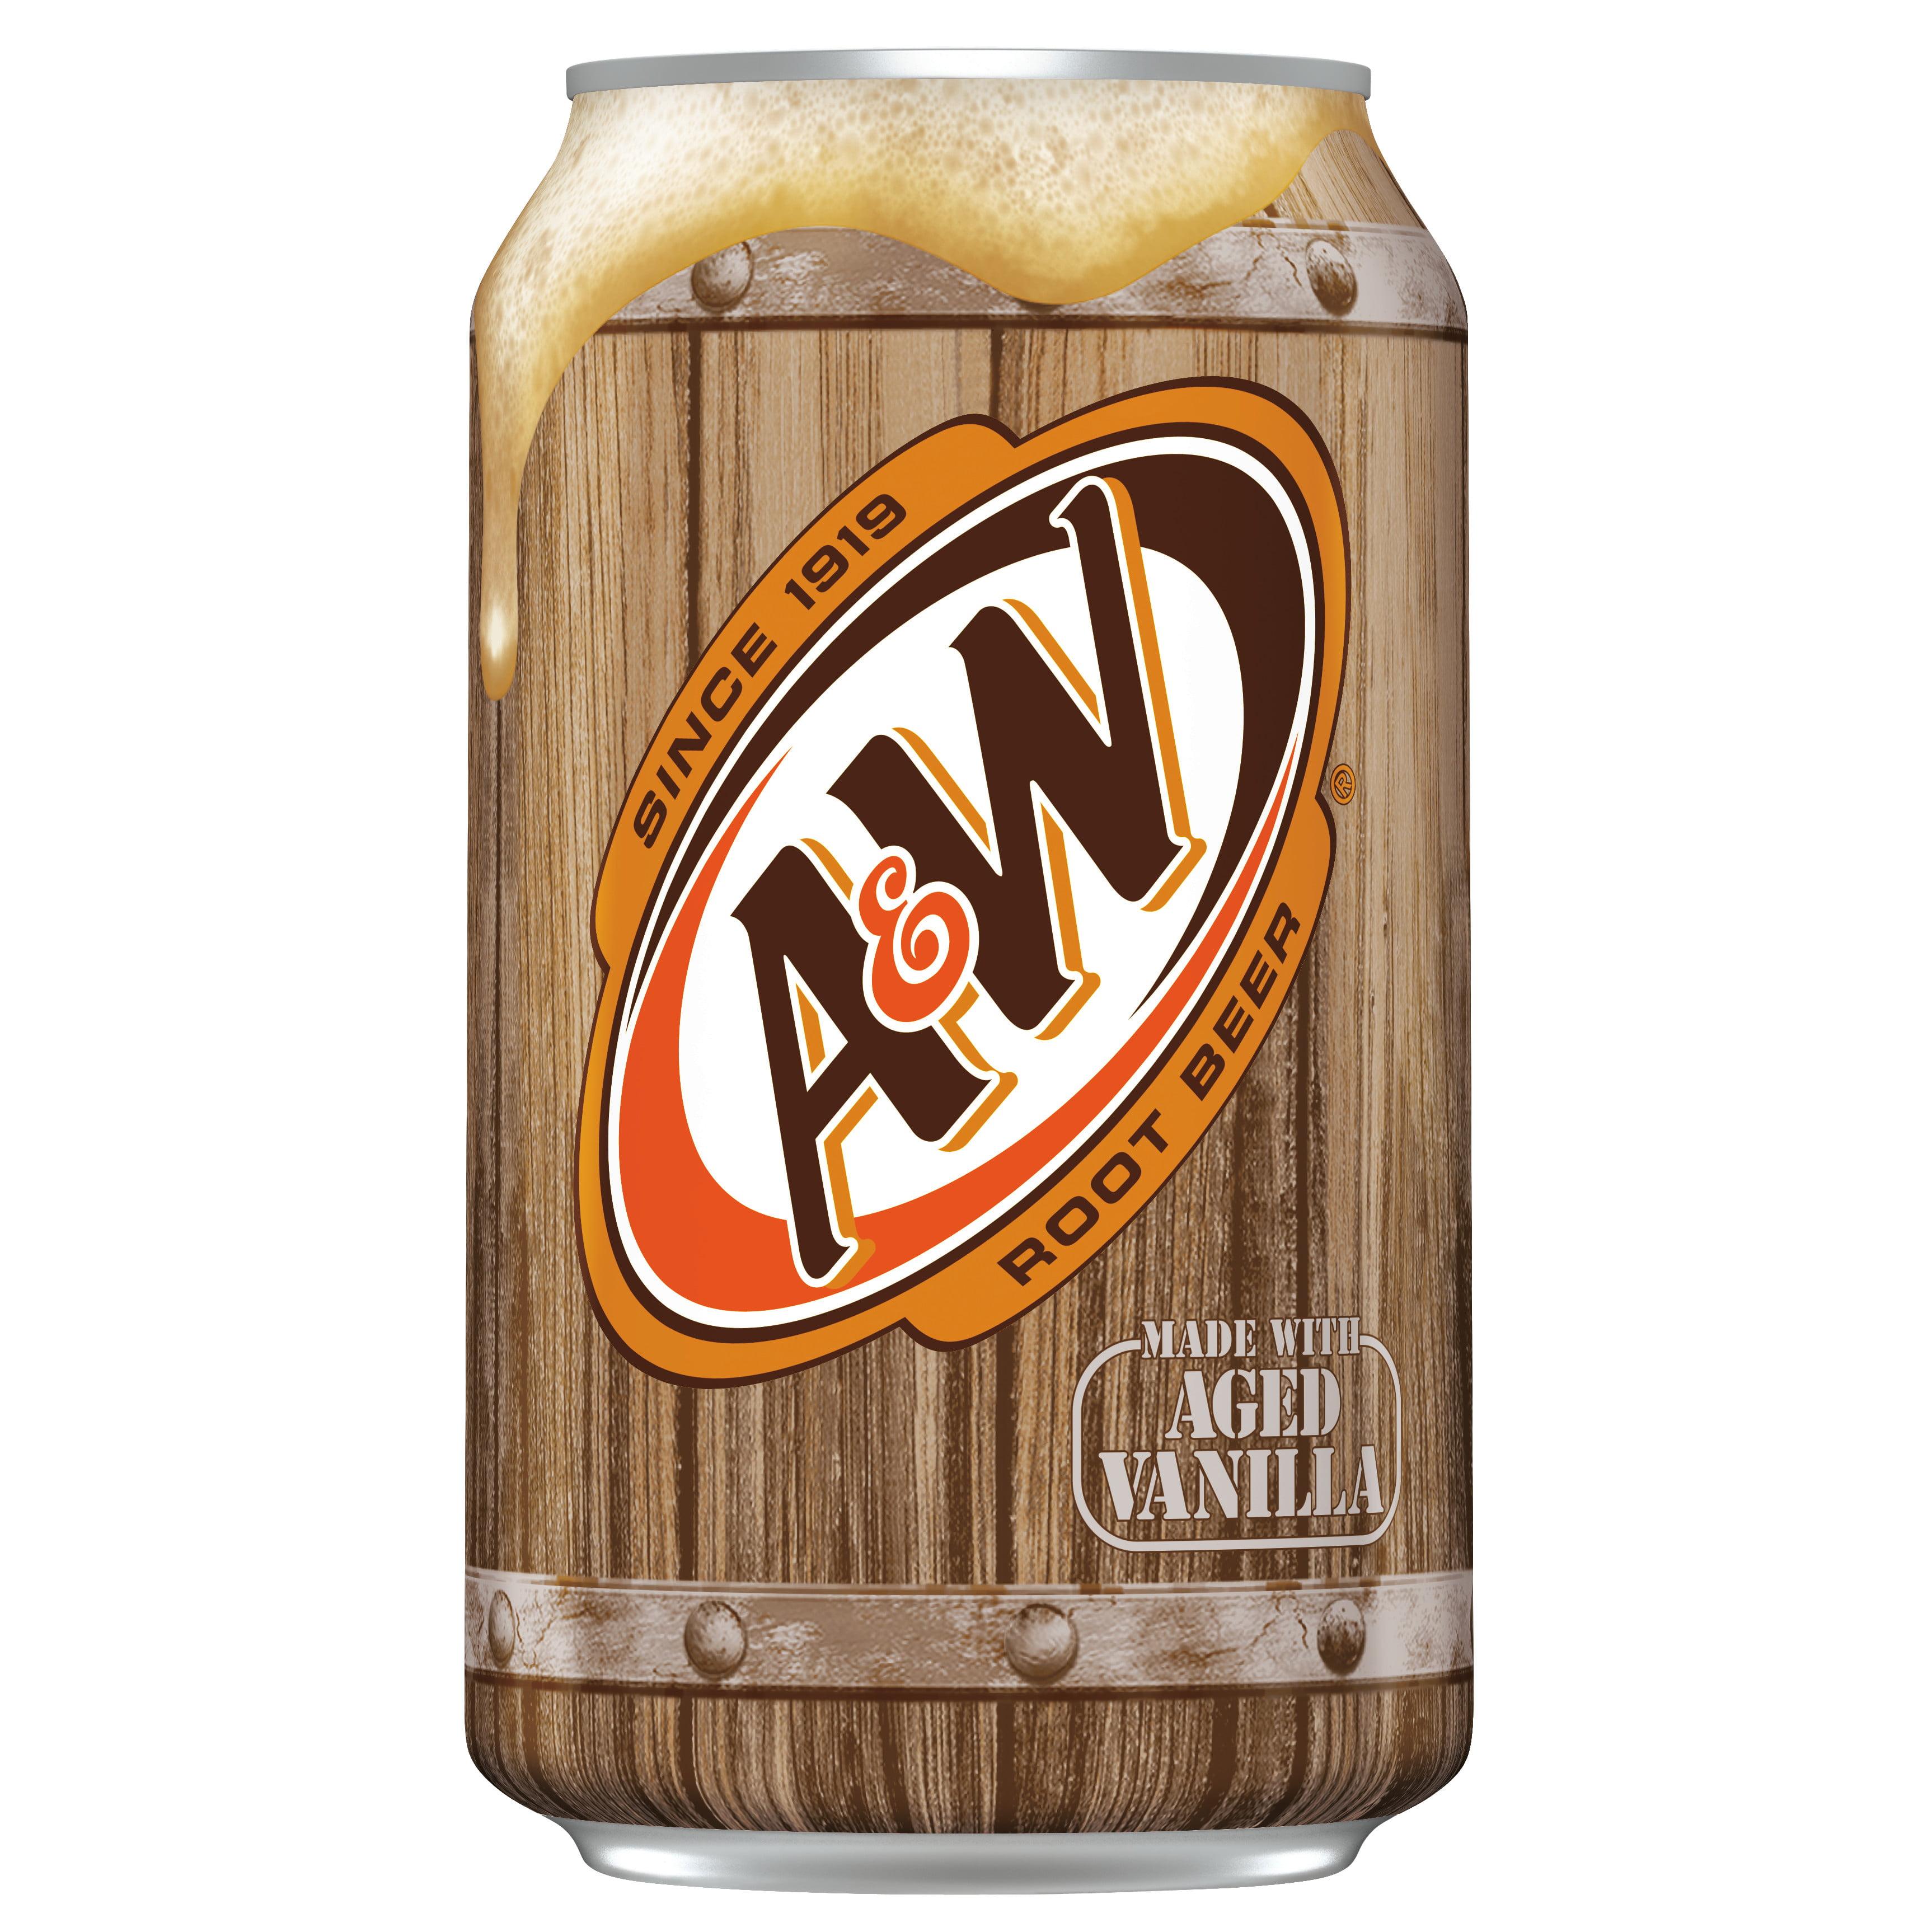 a&w root beer date code